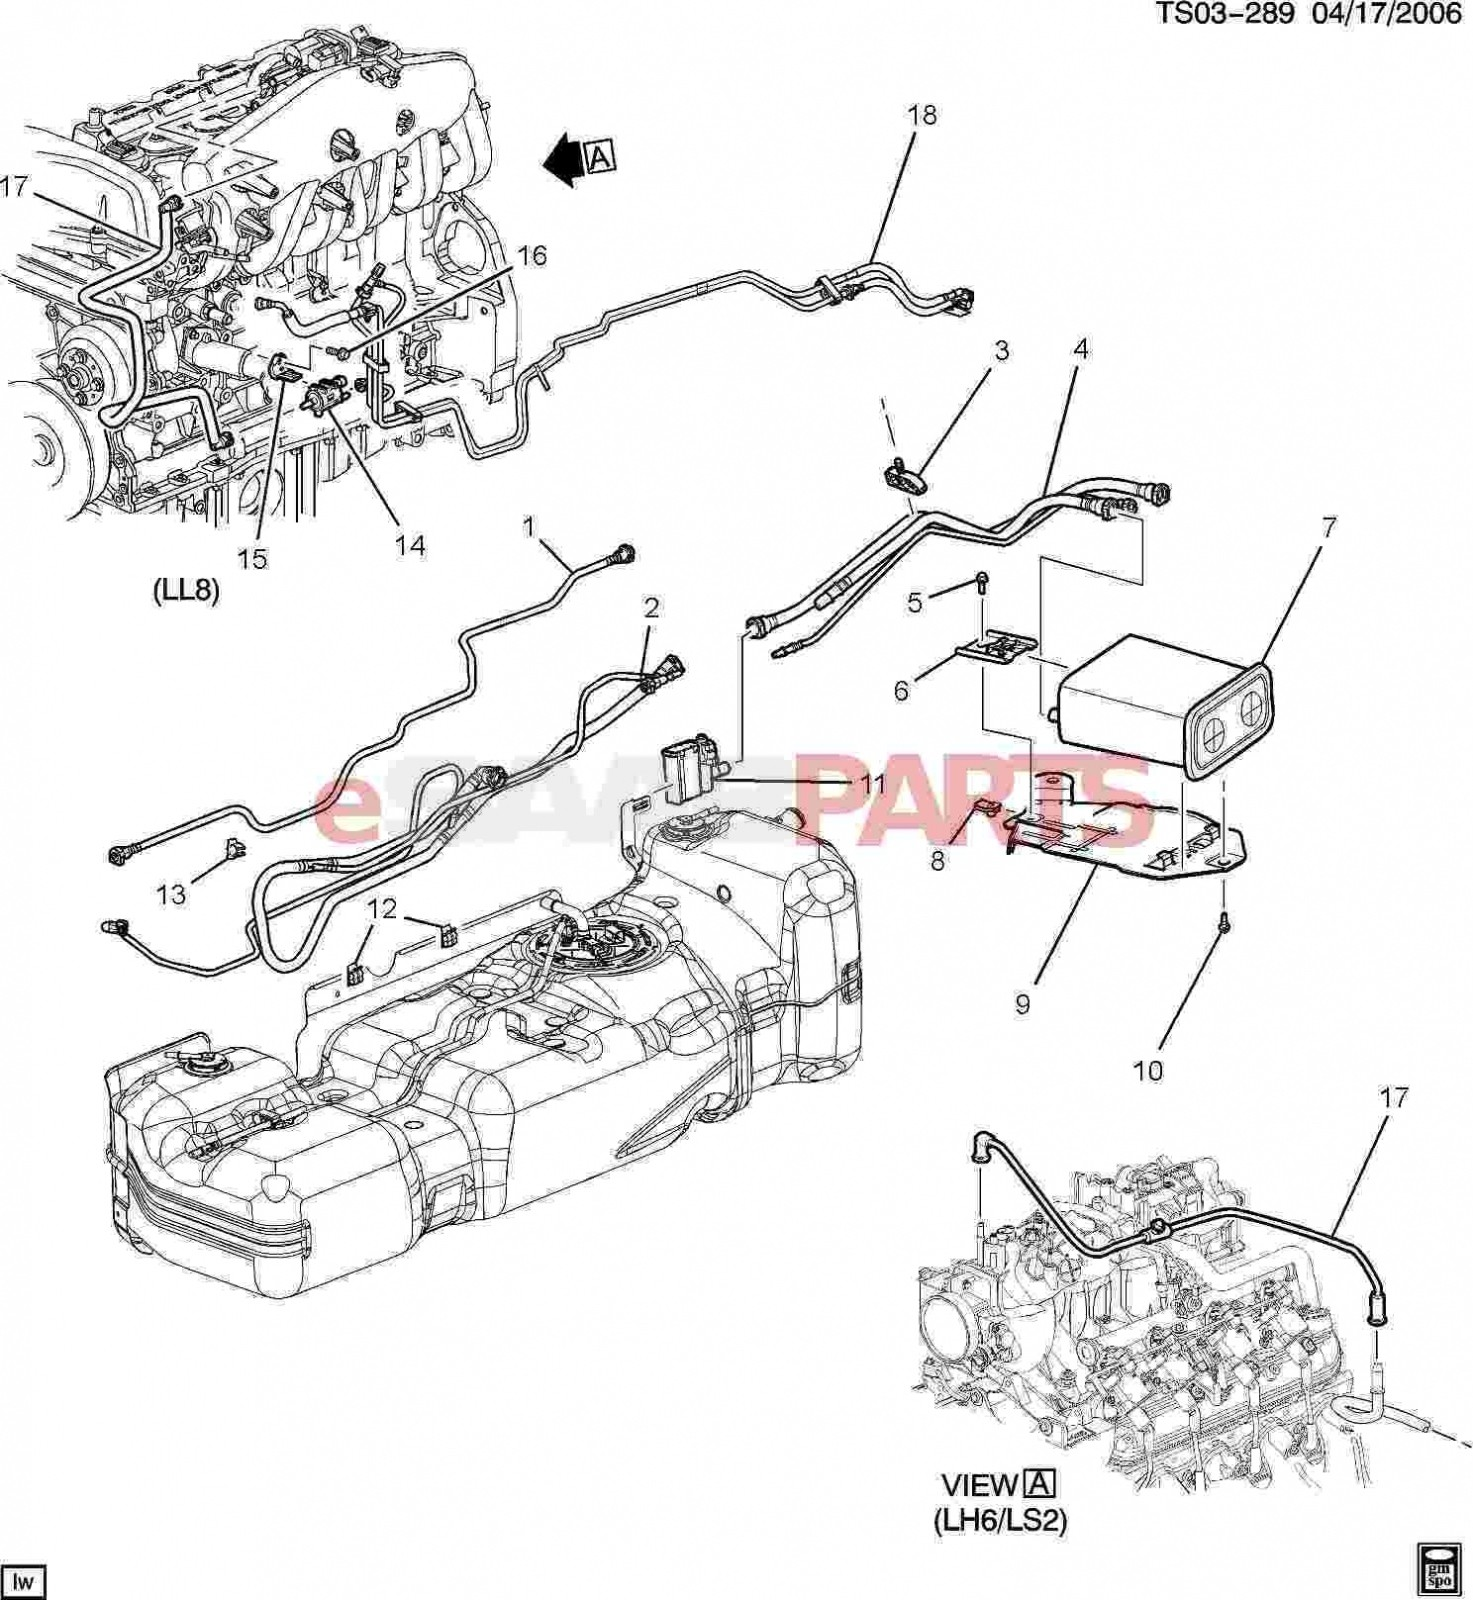 1999 Gmc Yukon Engine Diagram 2004 Gmc Parts Diagram Experts Wiring Diagram • Of 1999 Gmc Yukon Engine Diagram